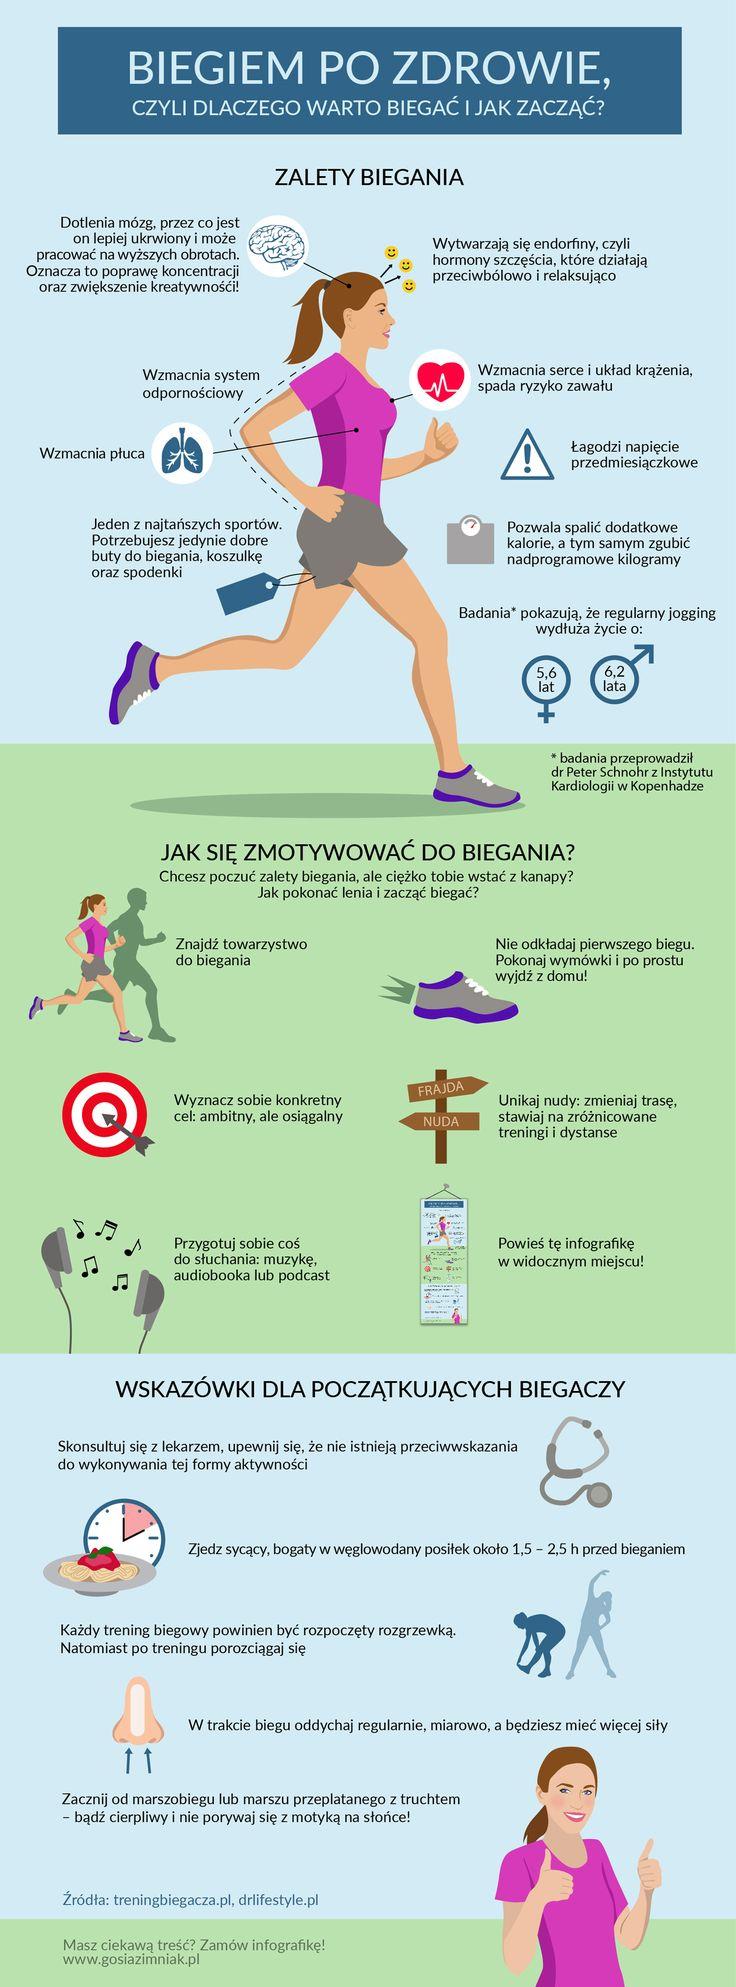 #infografika #infographic #bieganie #jogging #running